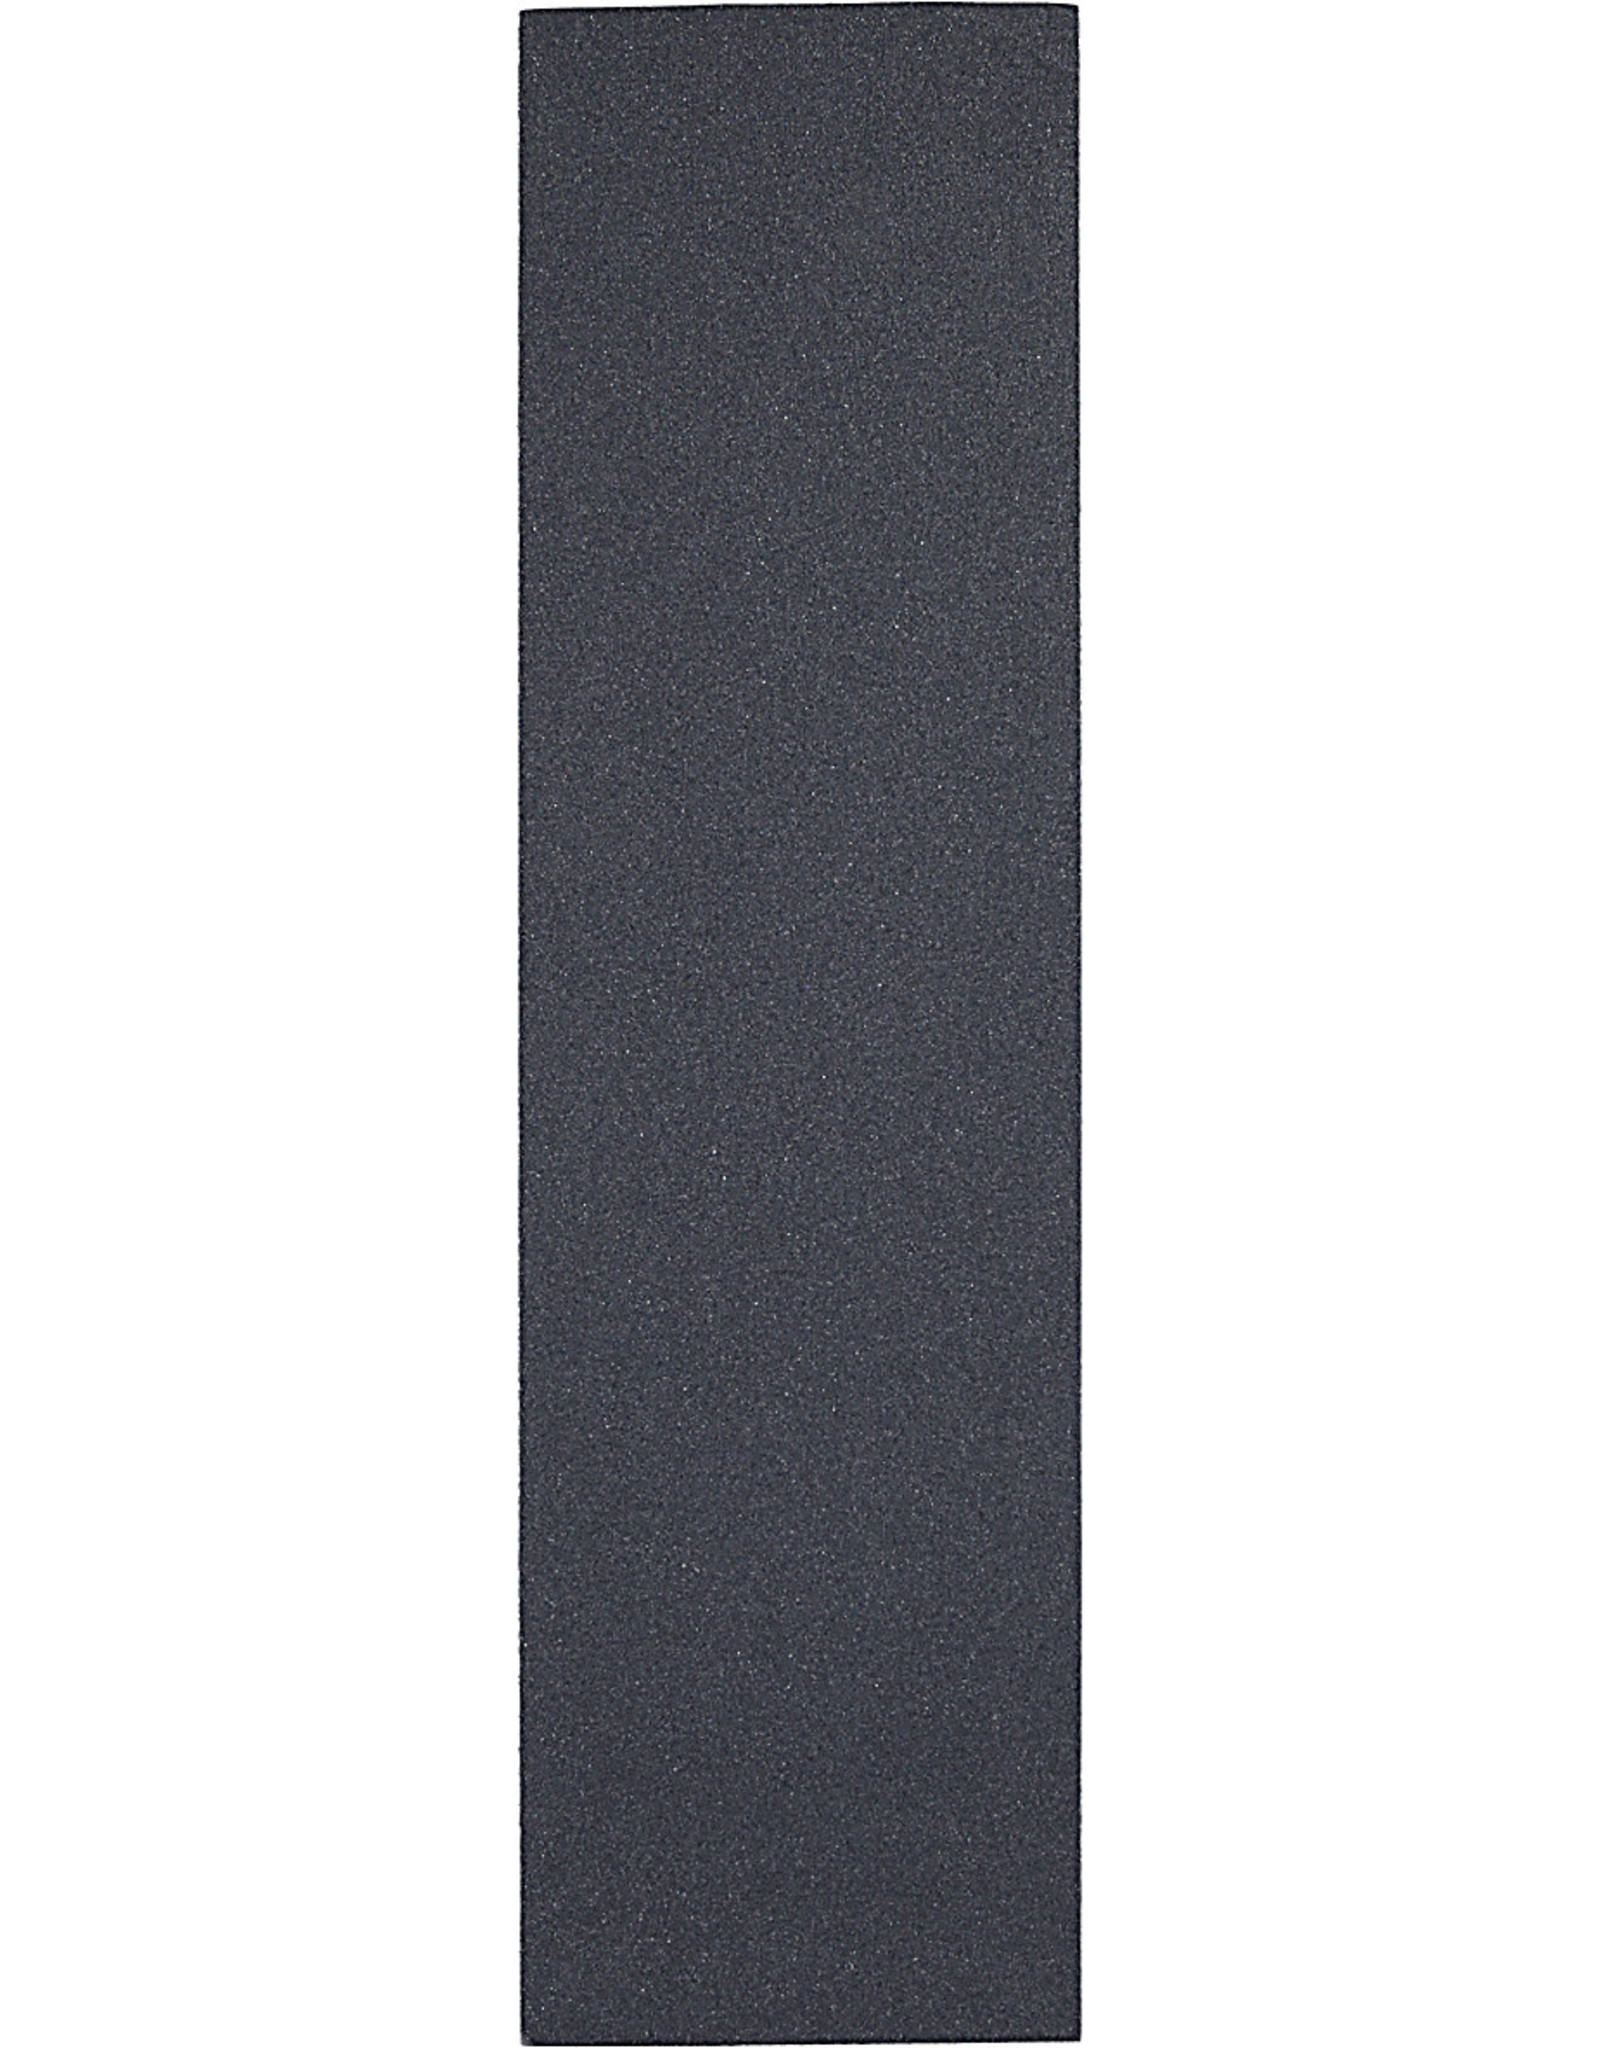 MOB MOB GRIPTAPE 9 X 33